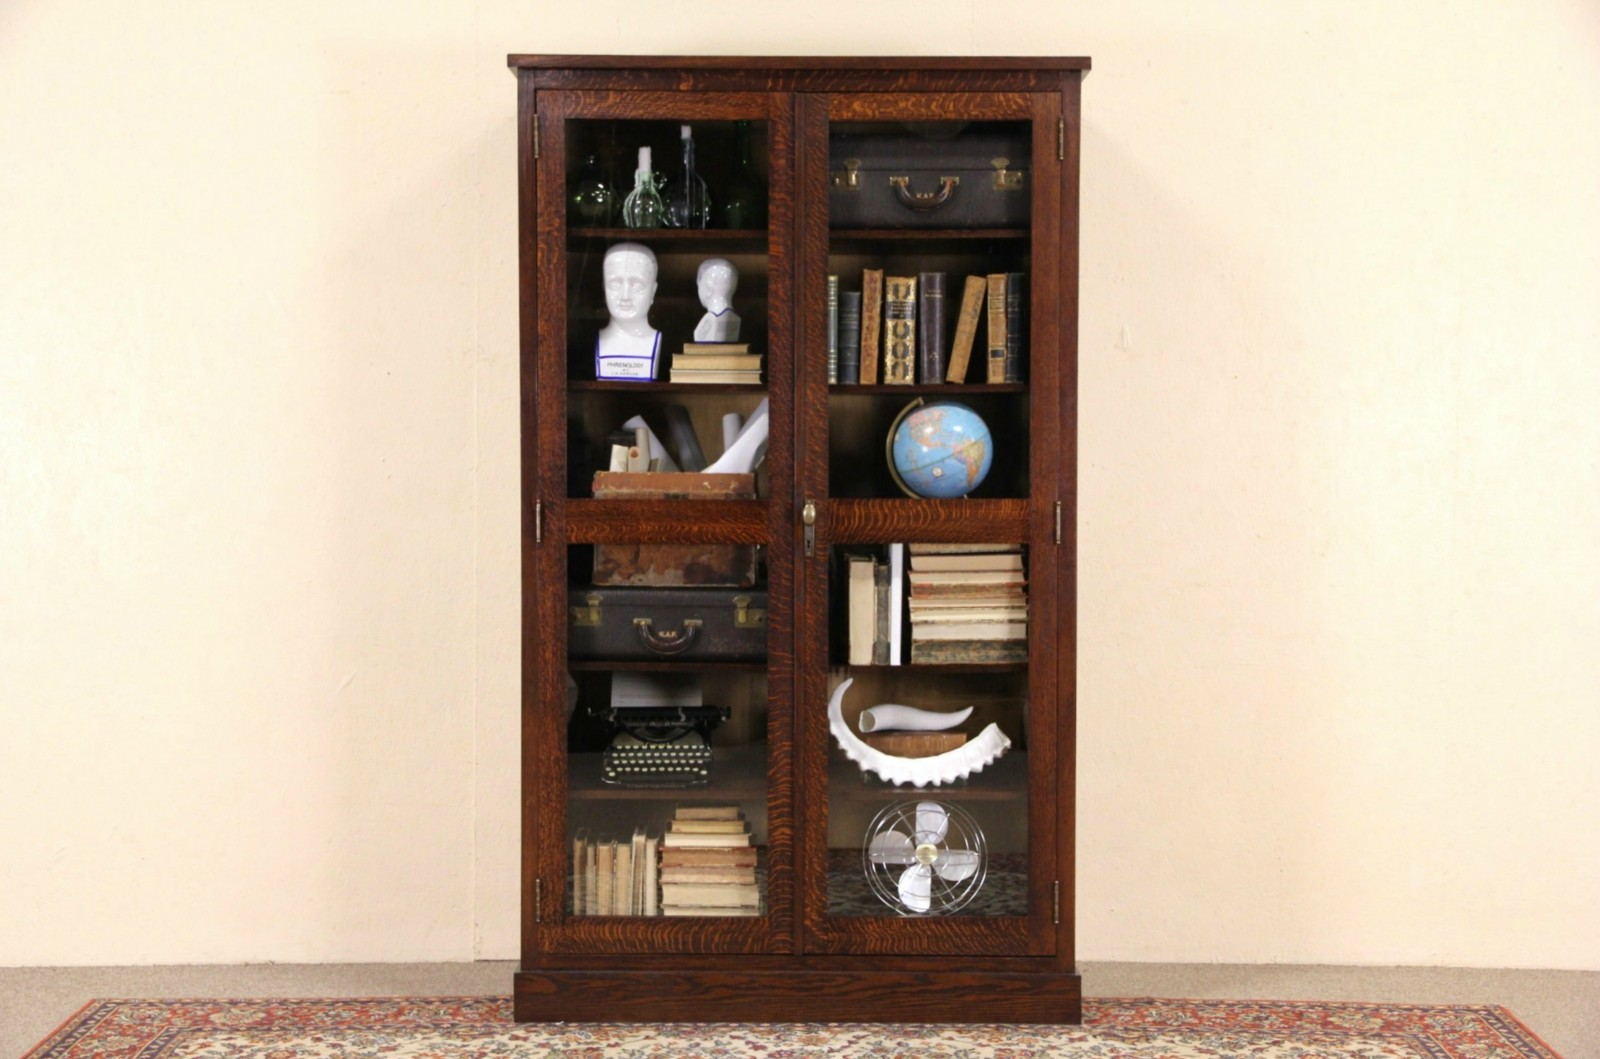 Sold art crafts mission oak 1910 antique bookcase or display art crafts mission oak 1910 antique bookcase or display cabinet glass doors planetlyrics Gallery